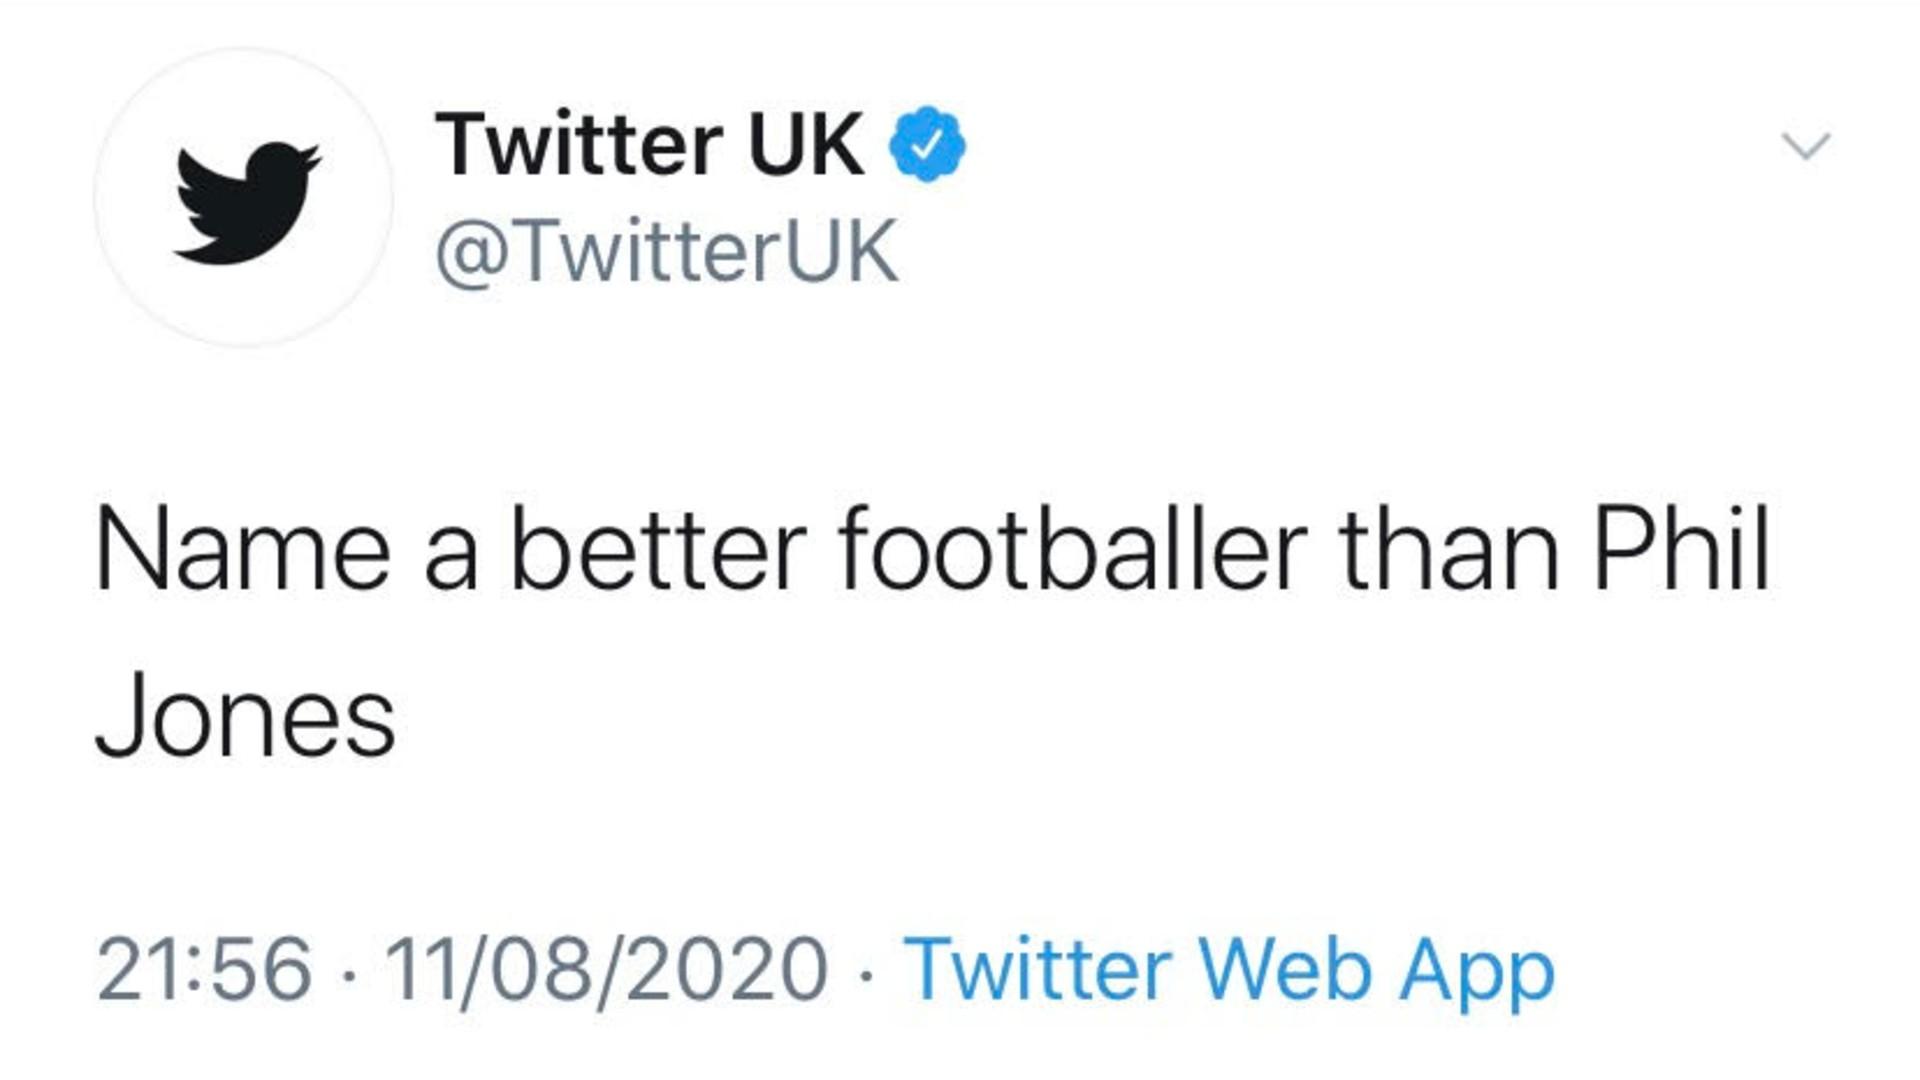 Twitter trolls Phil Jones